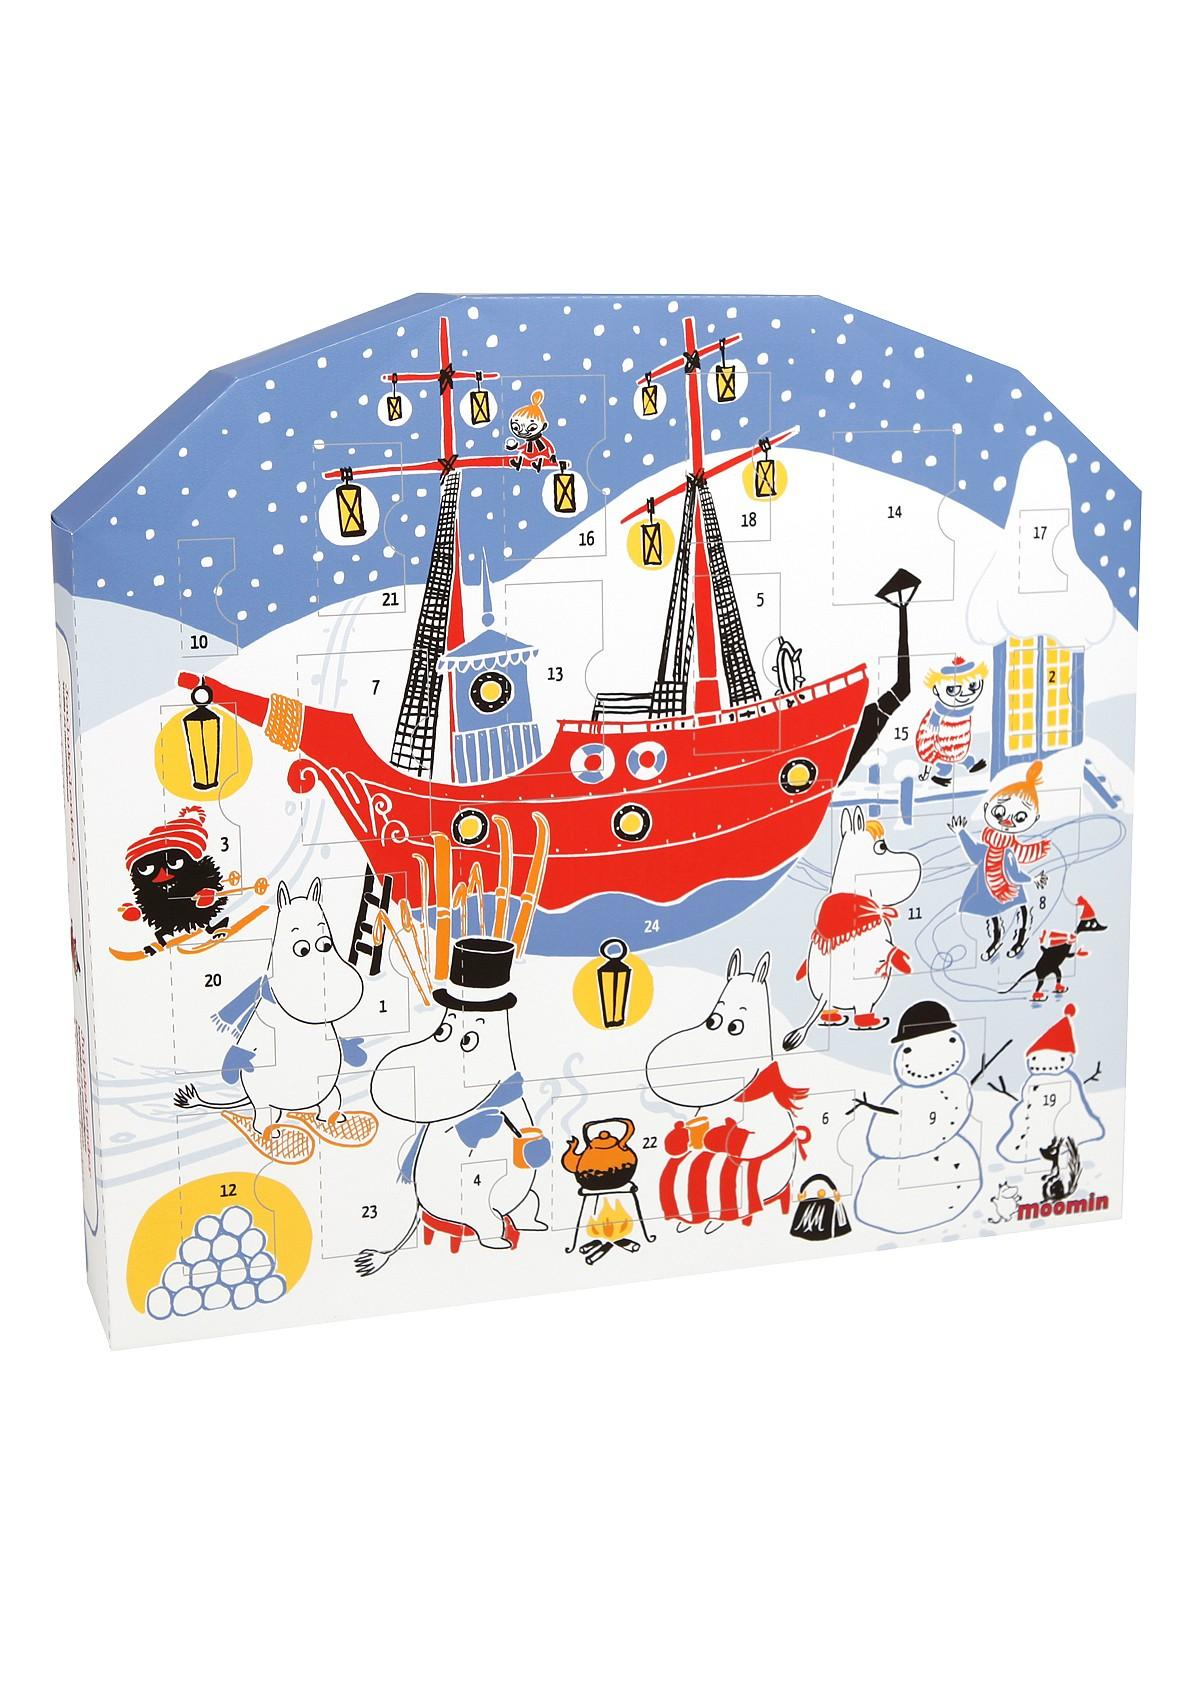 muumi joulukalenteri 2018 MUUMI   Muumi joulukalenteri 2013 | Hintaseuranta.fi muumi joulukalenteri 2018